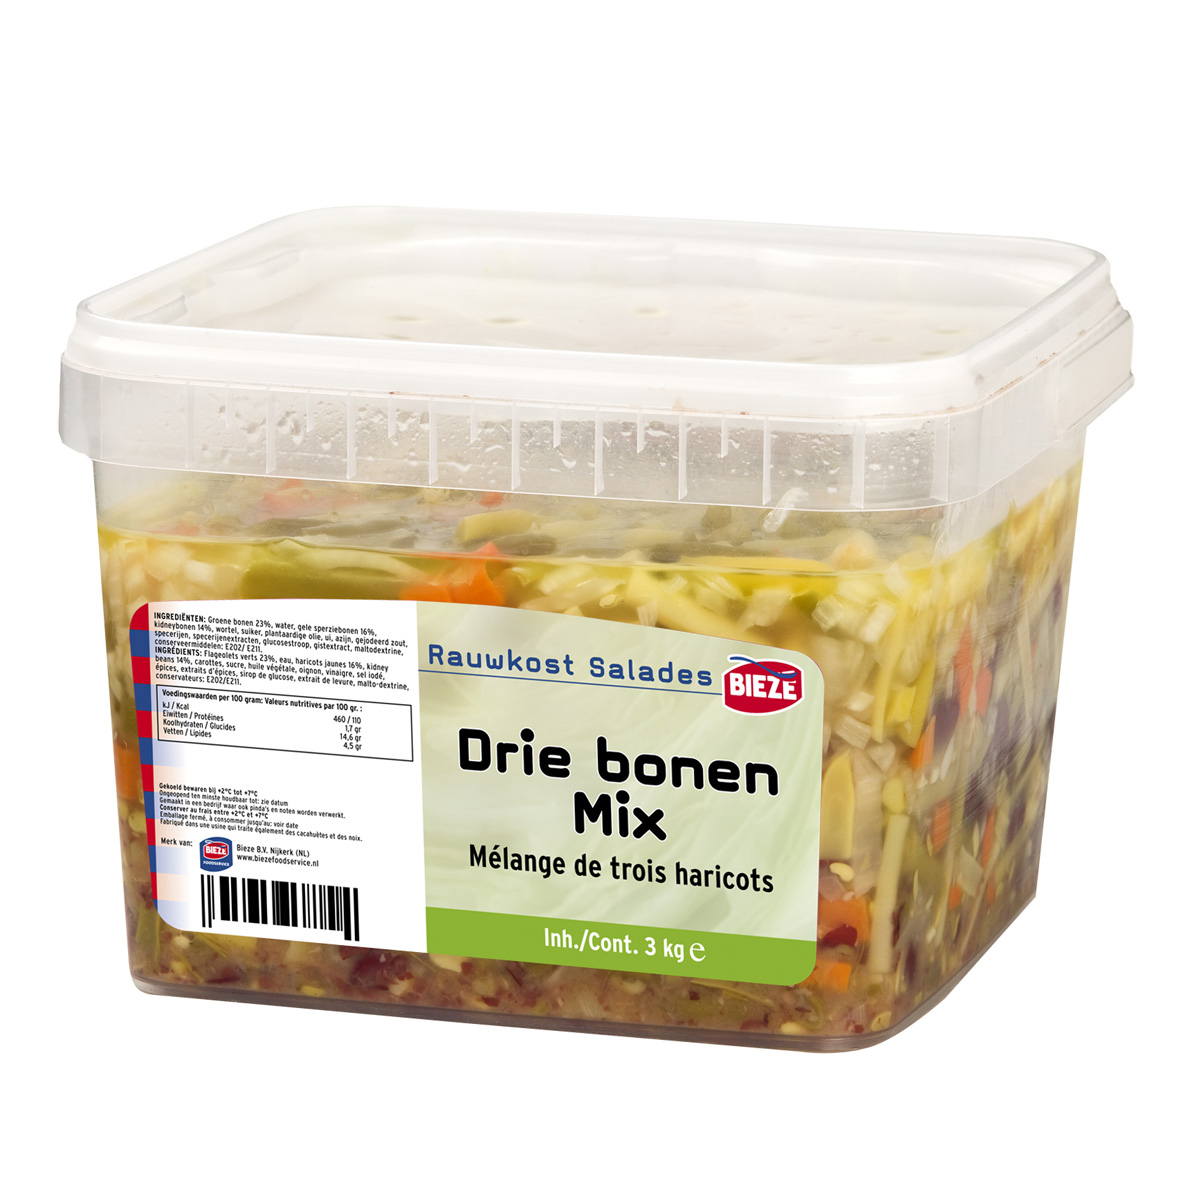 DRIE BONEN MIX - emmer